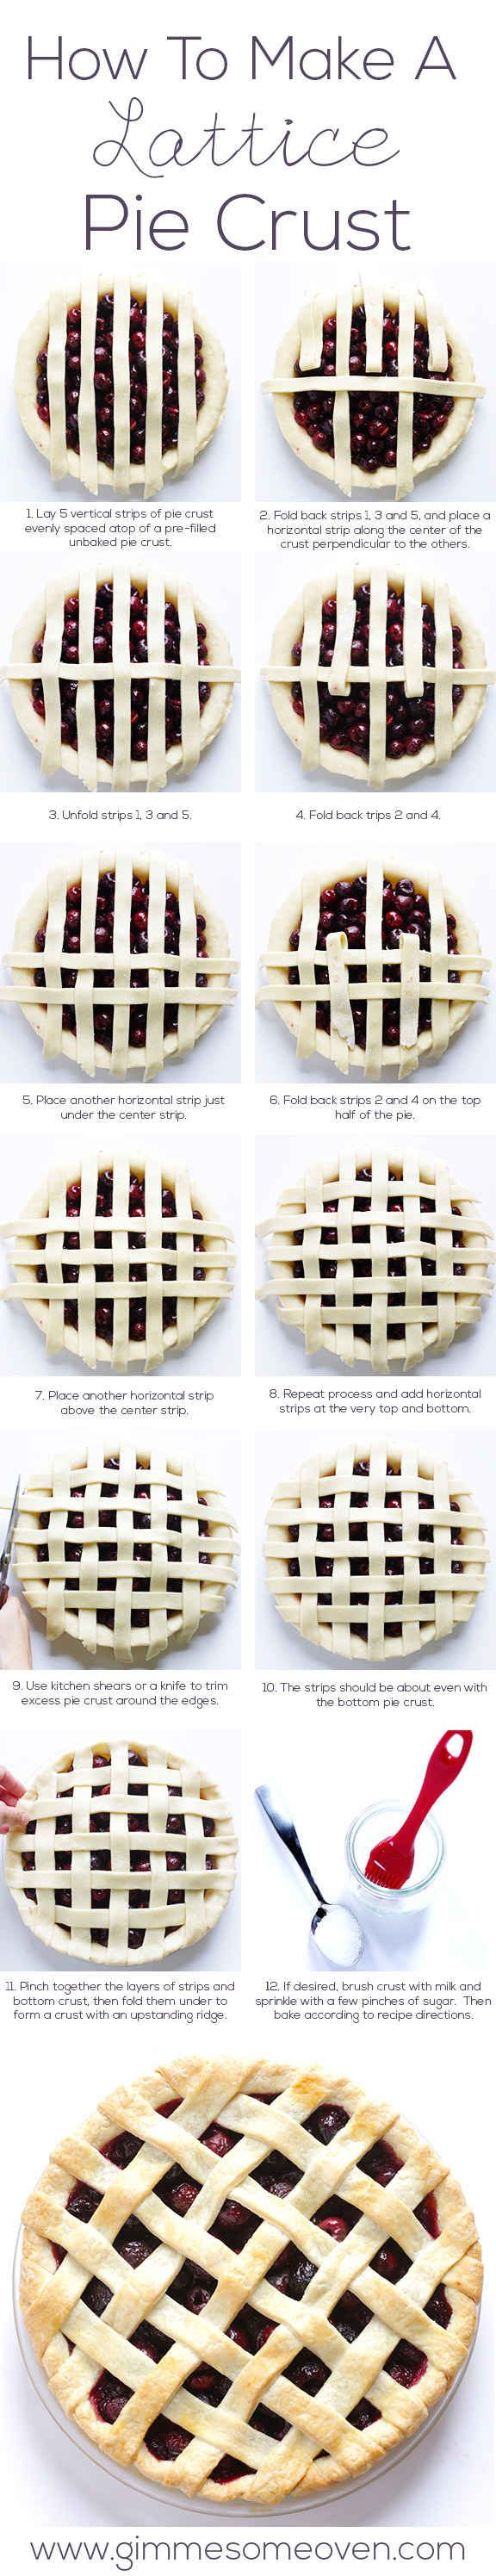 This aesthetic pie crust chart: